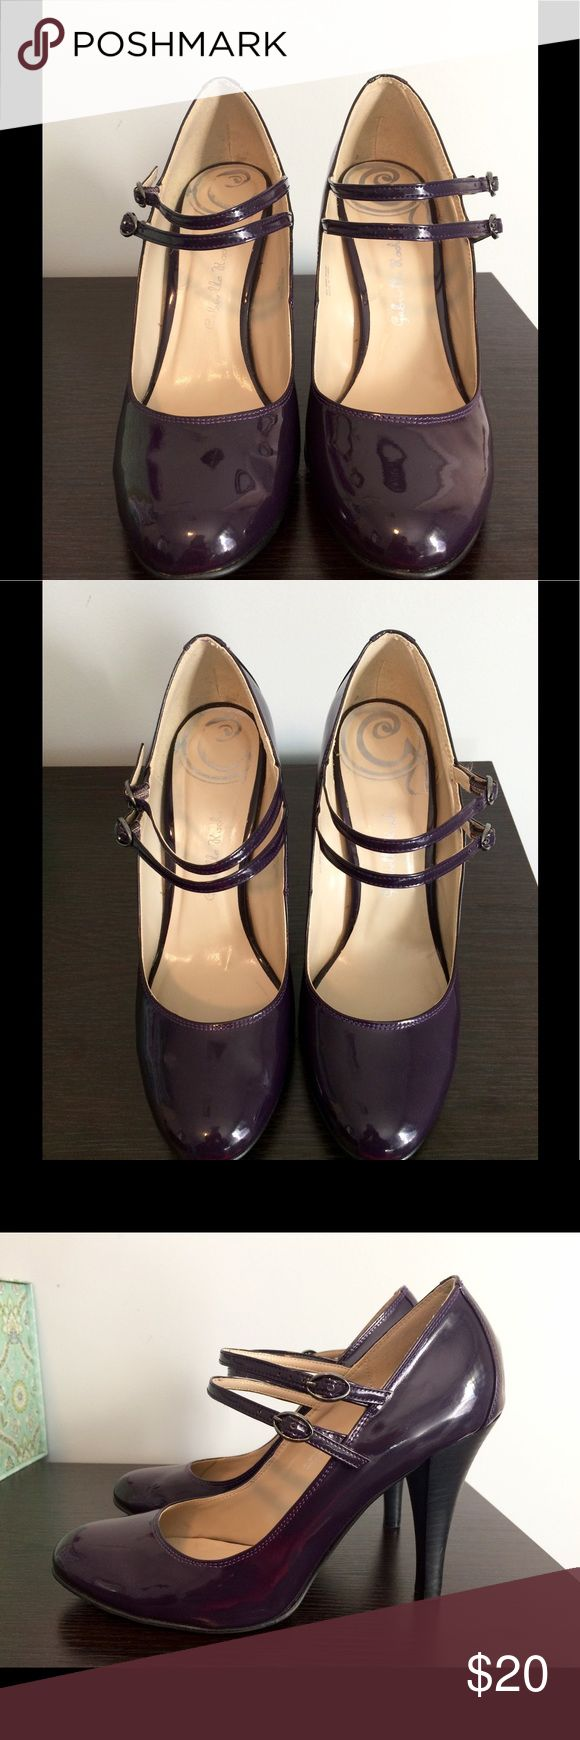 Gabriella Rocha Mary Jane heels Cute dark purple/plum 4 inch Mary Jane pumps. Only worn a couple times. Great condition. Gabriella Rocha Shoes Heels